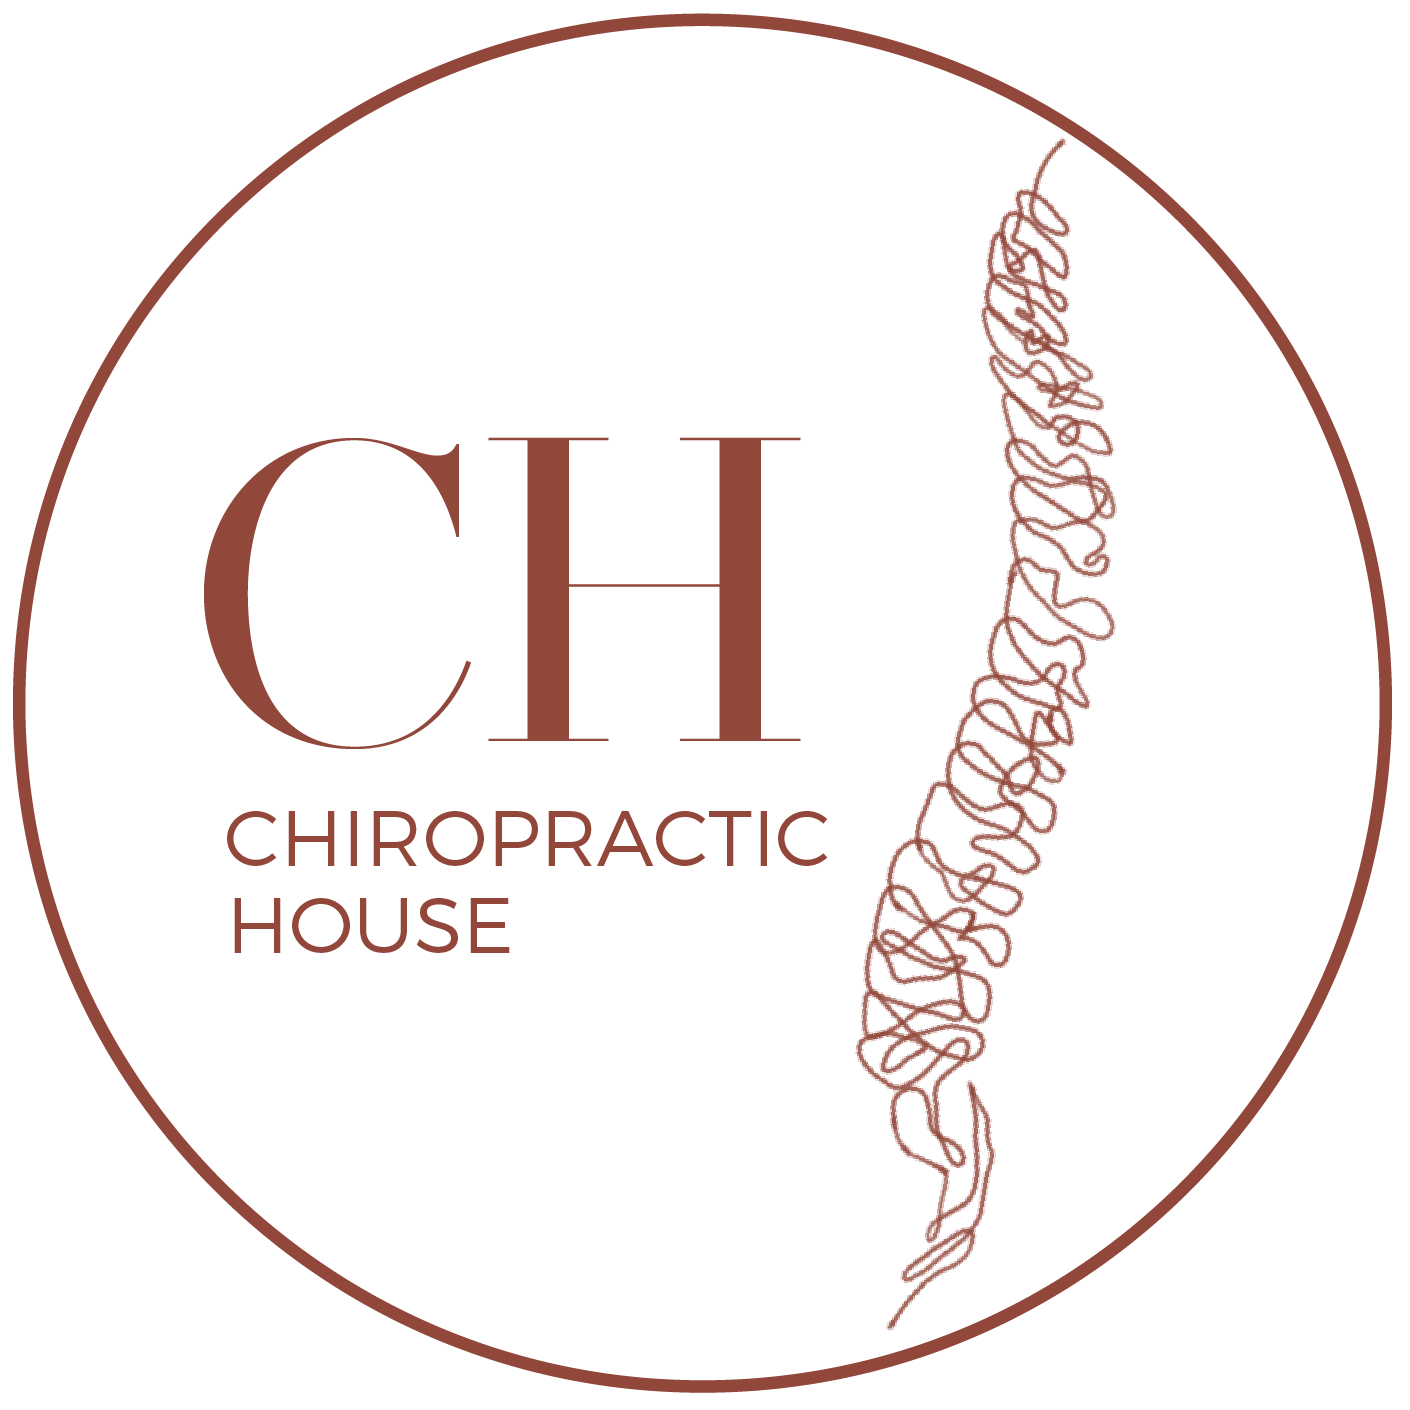 chiropractic house north kiara logo